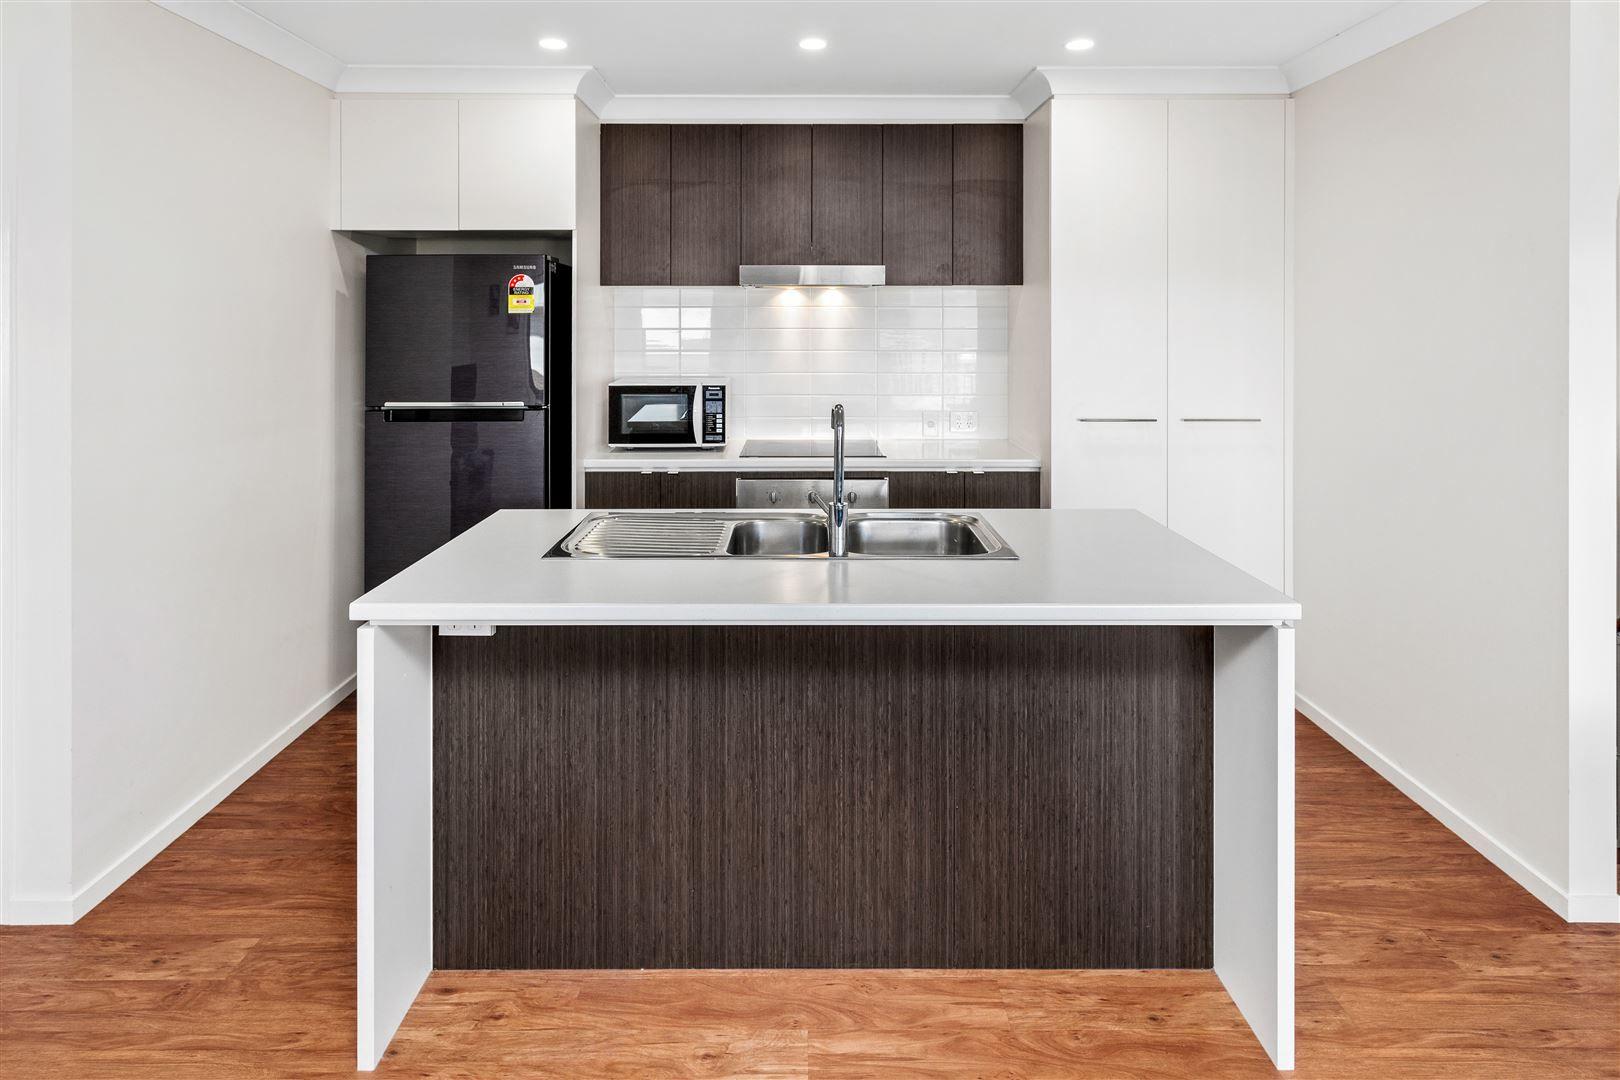 214/25 Farinazzo Street, Richlands QLD 4077, Image 1